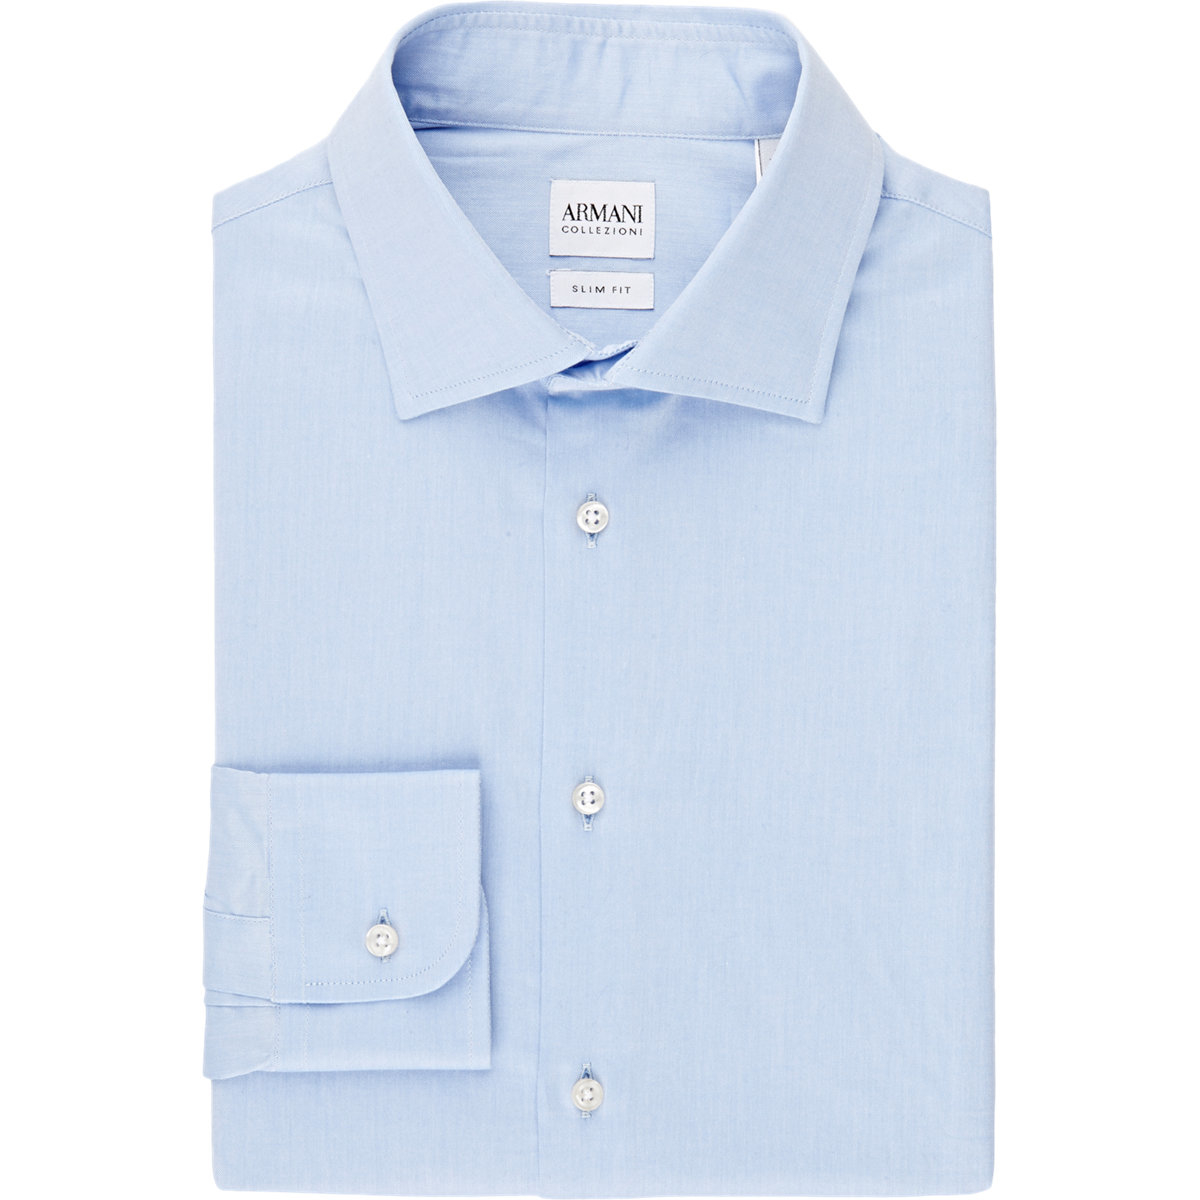 armani mens slimfit dress shirt in blue for men lyst